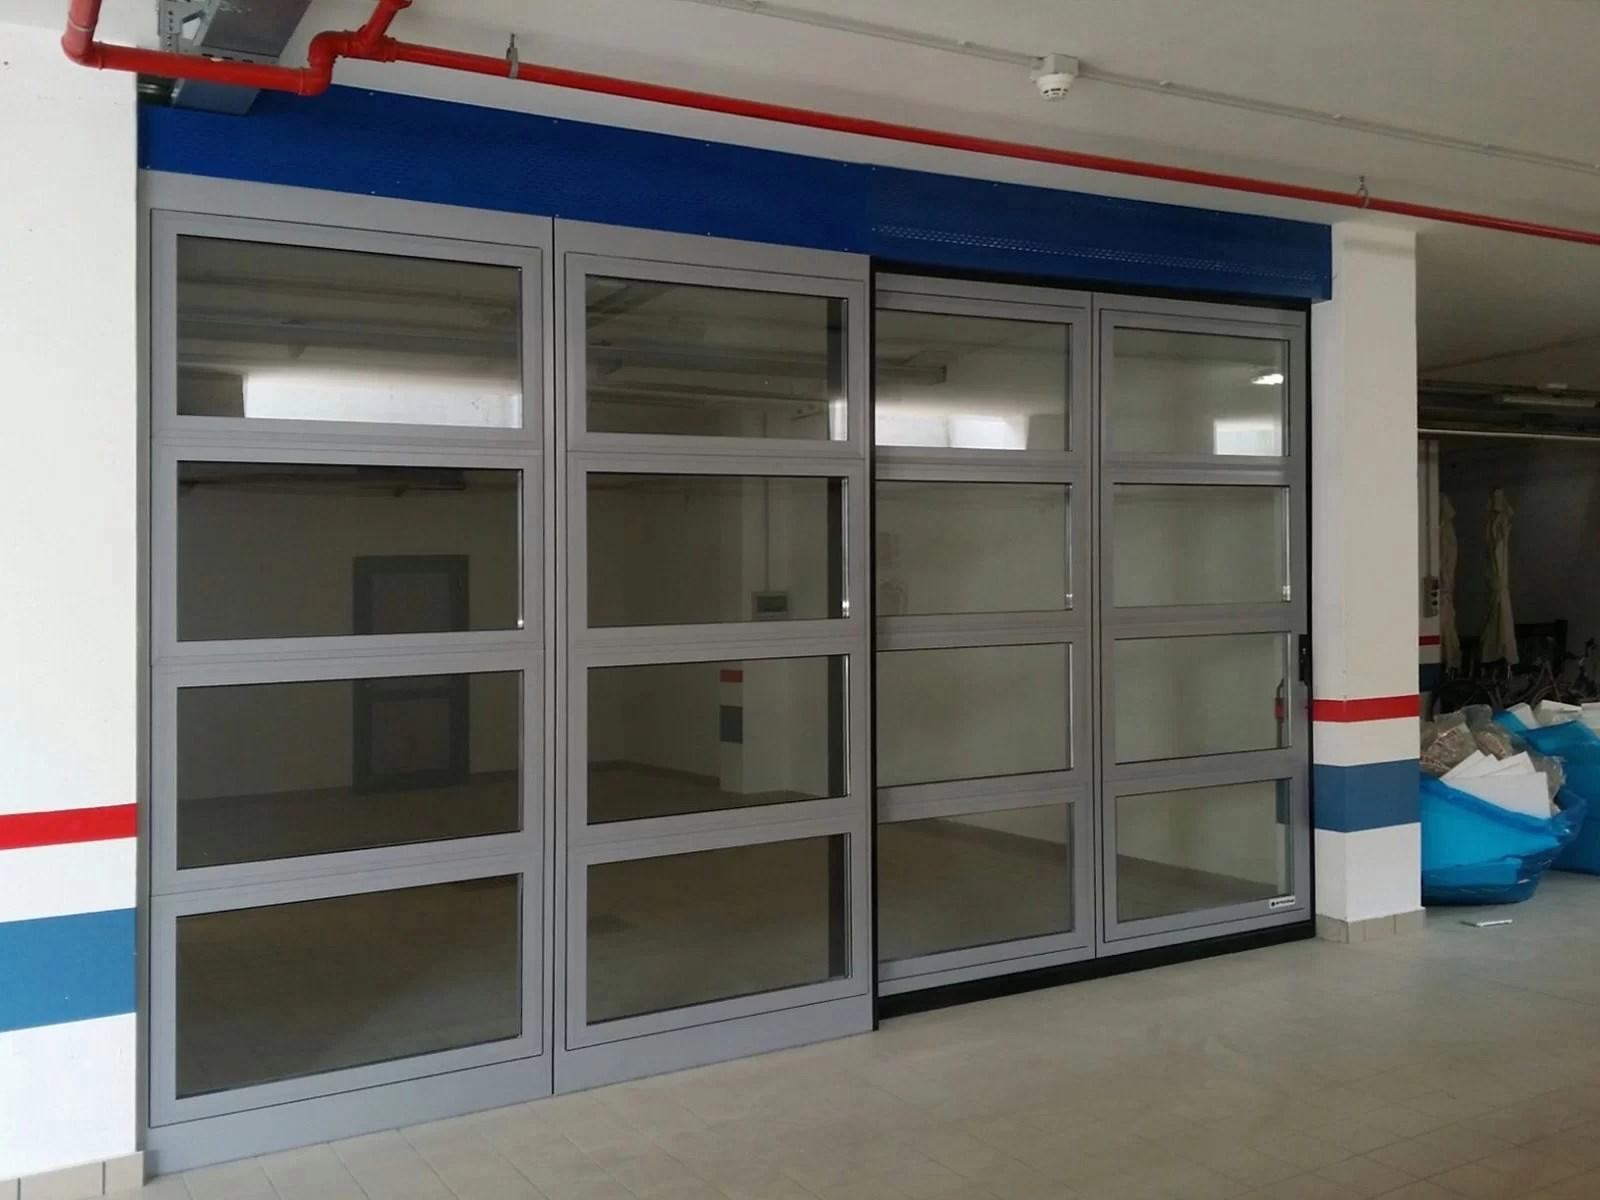 Portone scorrevole industriale ATLANTE - Grigio RAL 9006 con vetrature